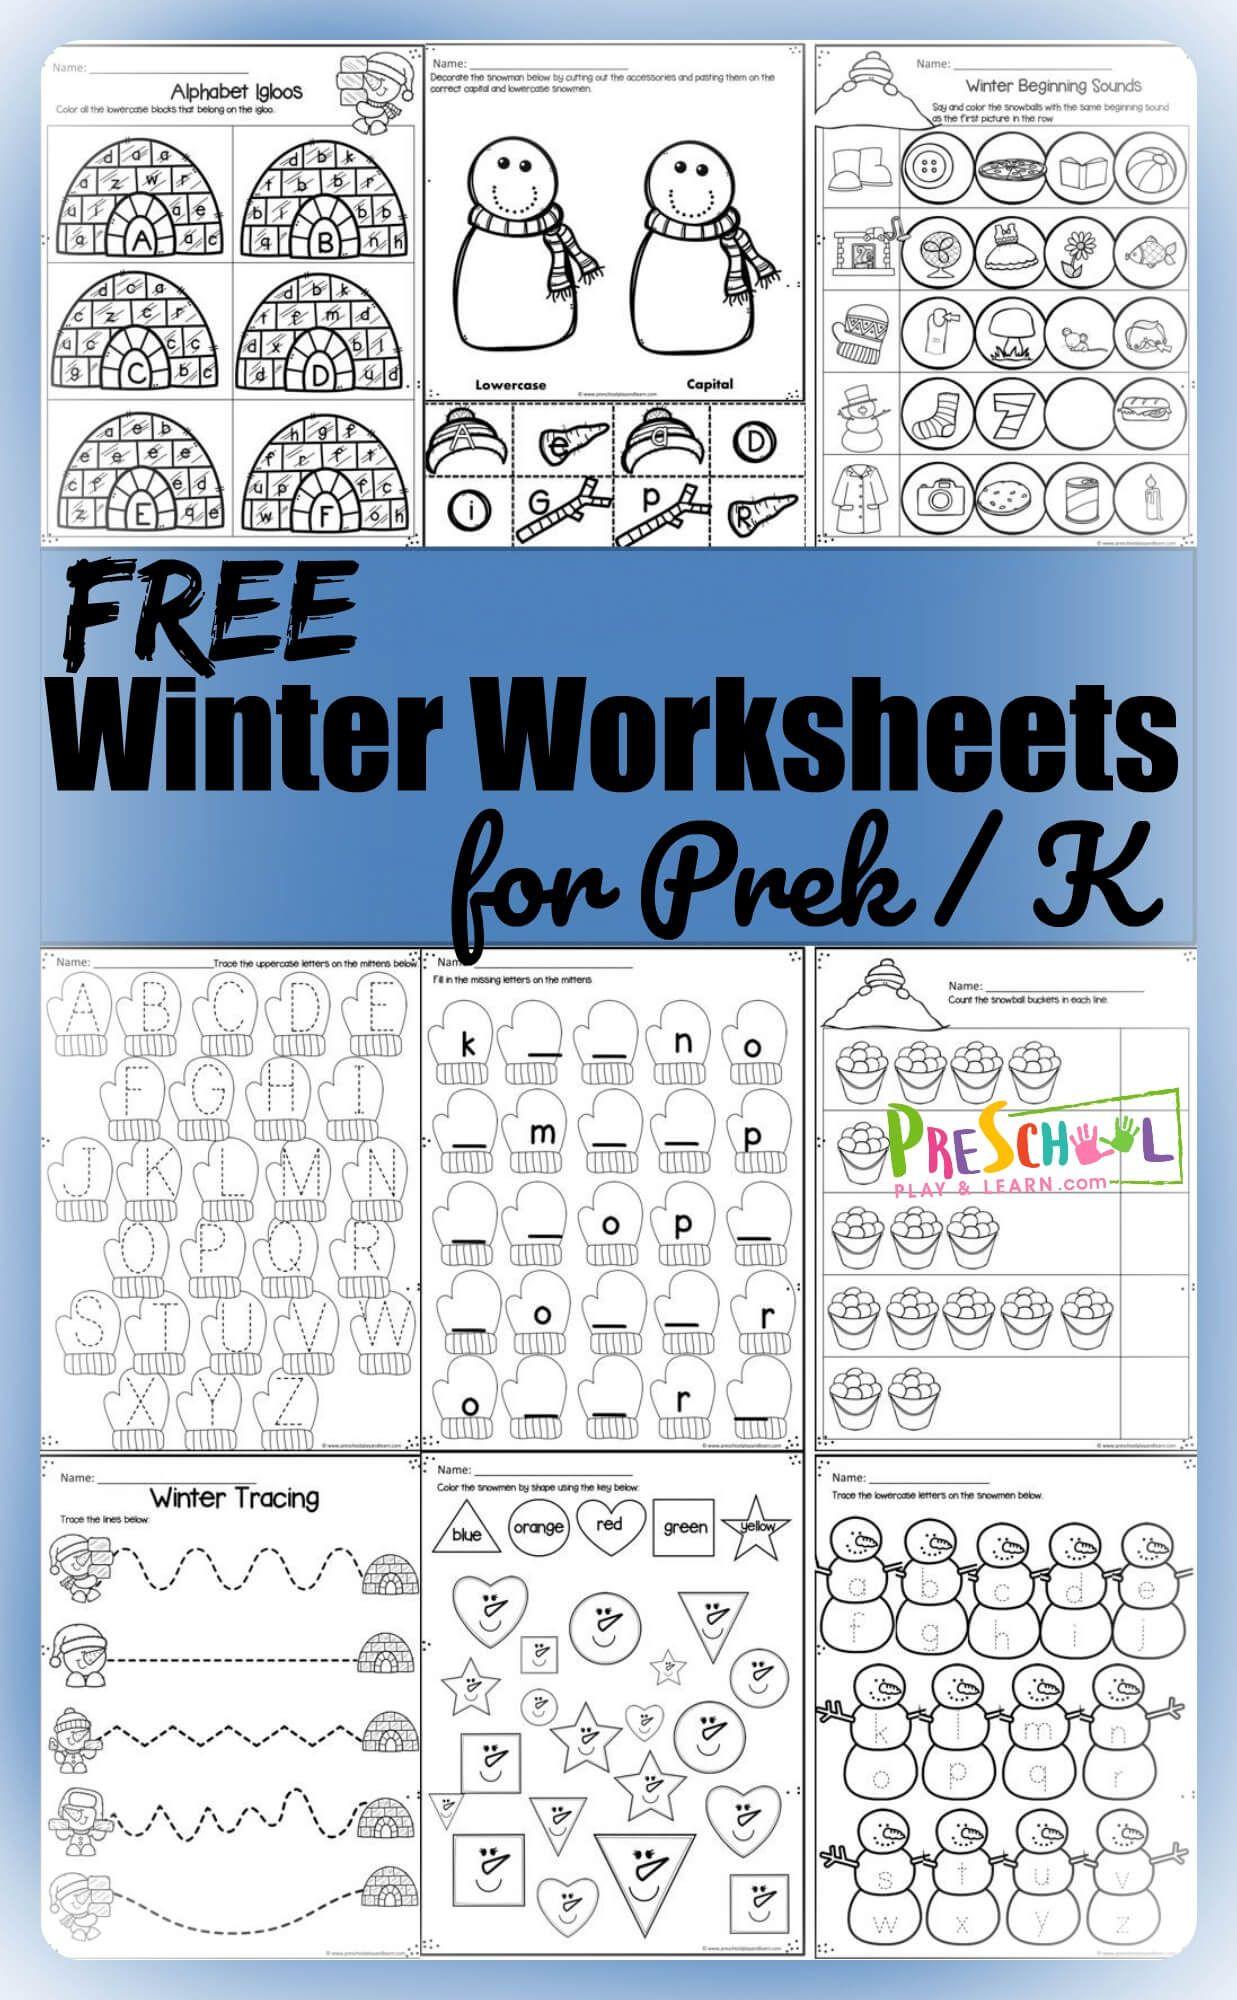 Free Winter Worksheets